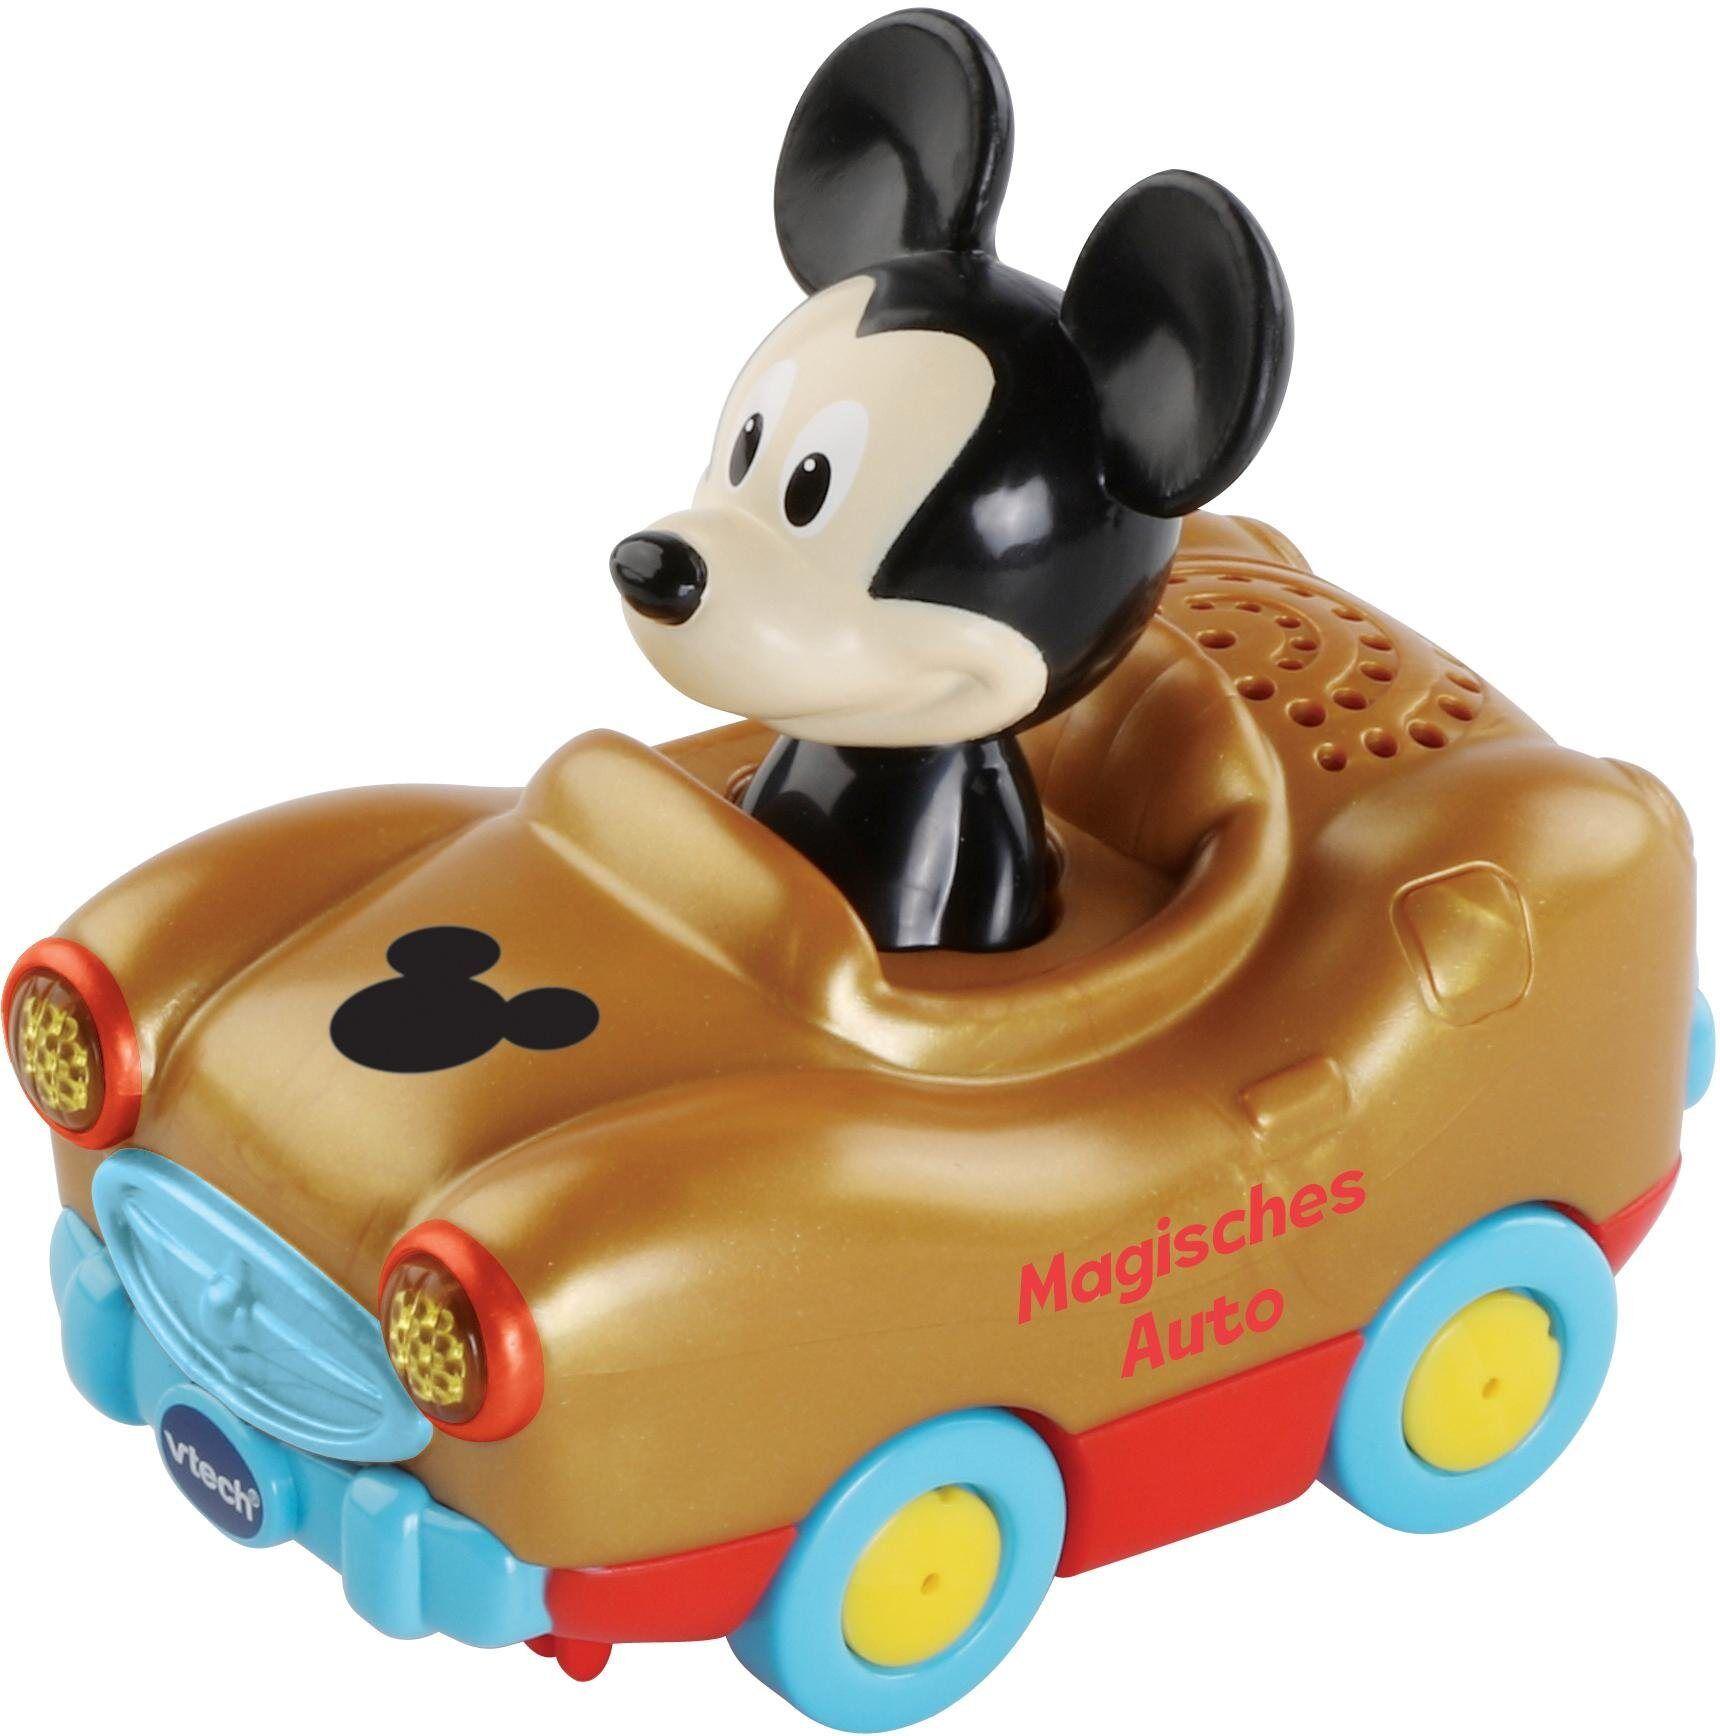 Vtech® Spielzeug-Auto »Tut Tut Baby Flitzer - Mickys magisches Auto«, bunt